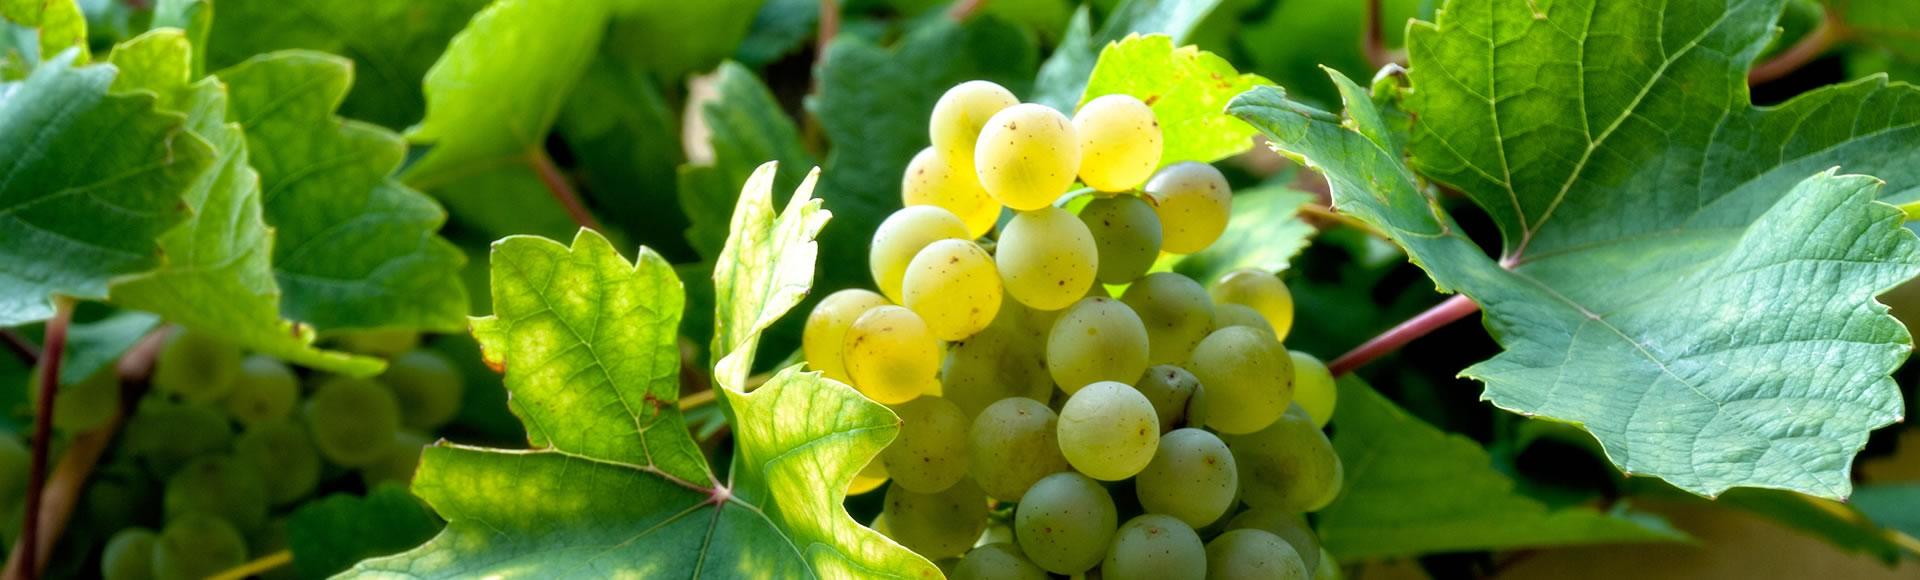 Naturnaher Weinbau!